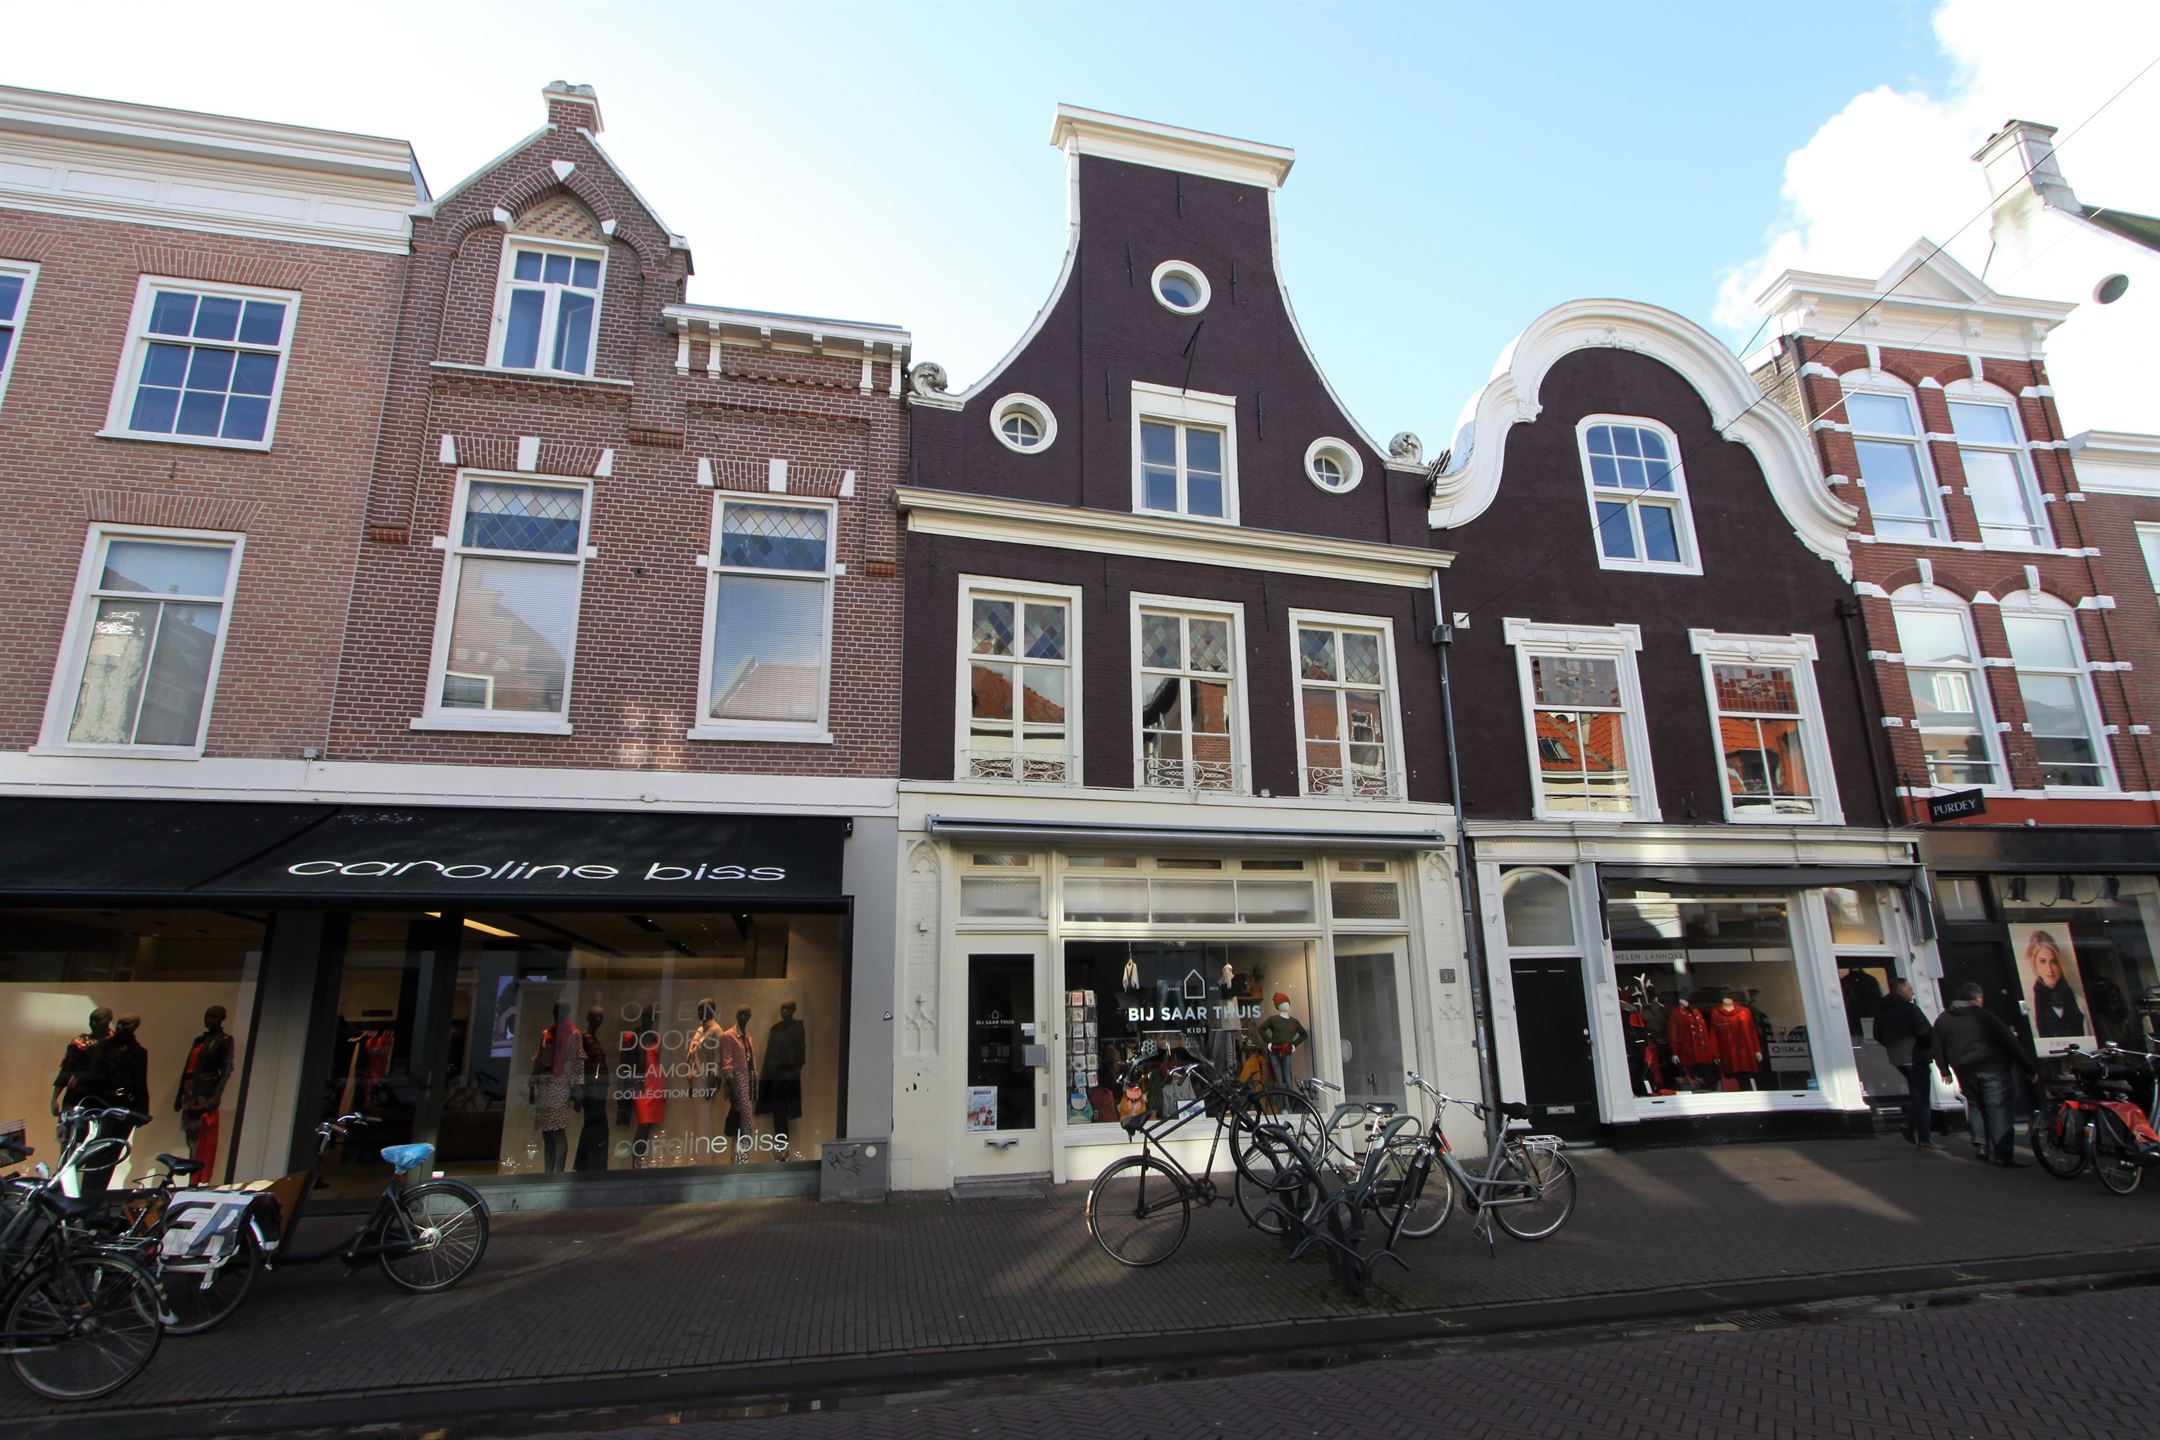 Haarlem zoek verkocht zijlstraat 88 2011 tr haarlem for Funda haarlem centrum